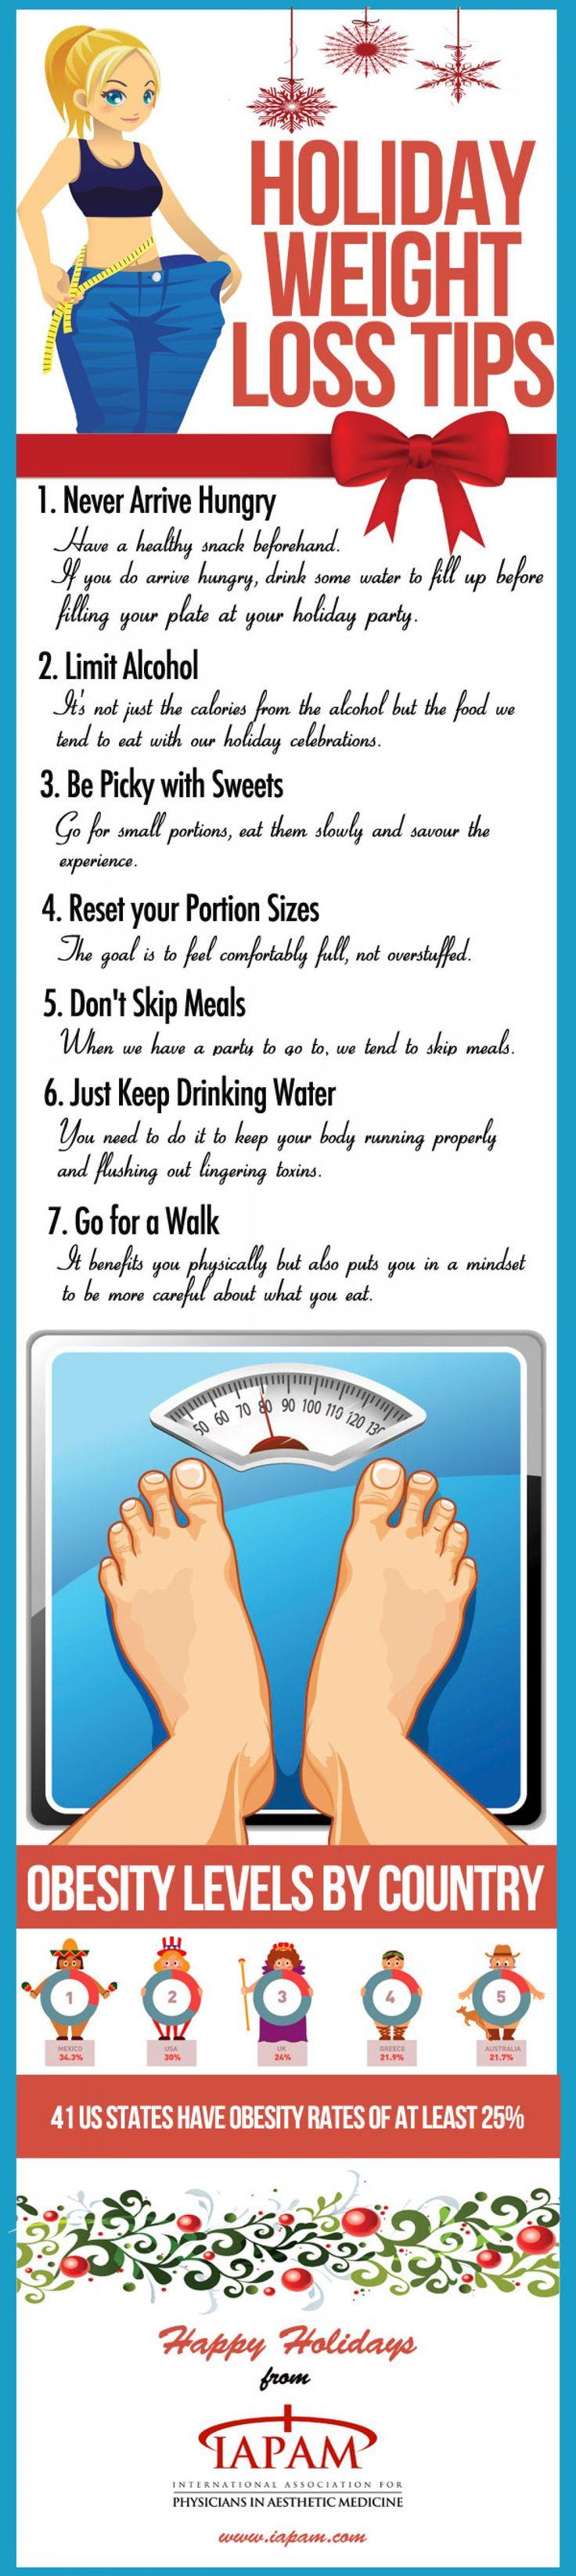 Holiday Weight Loss tips diet dietplan dietprogram food foods weightloss …